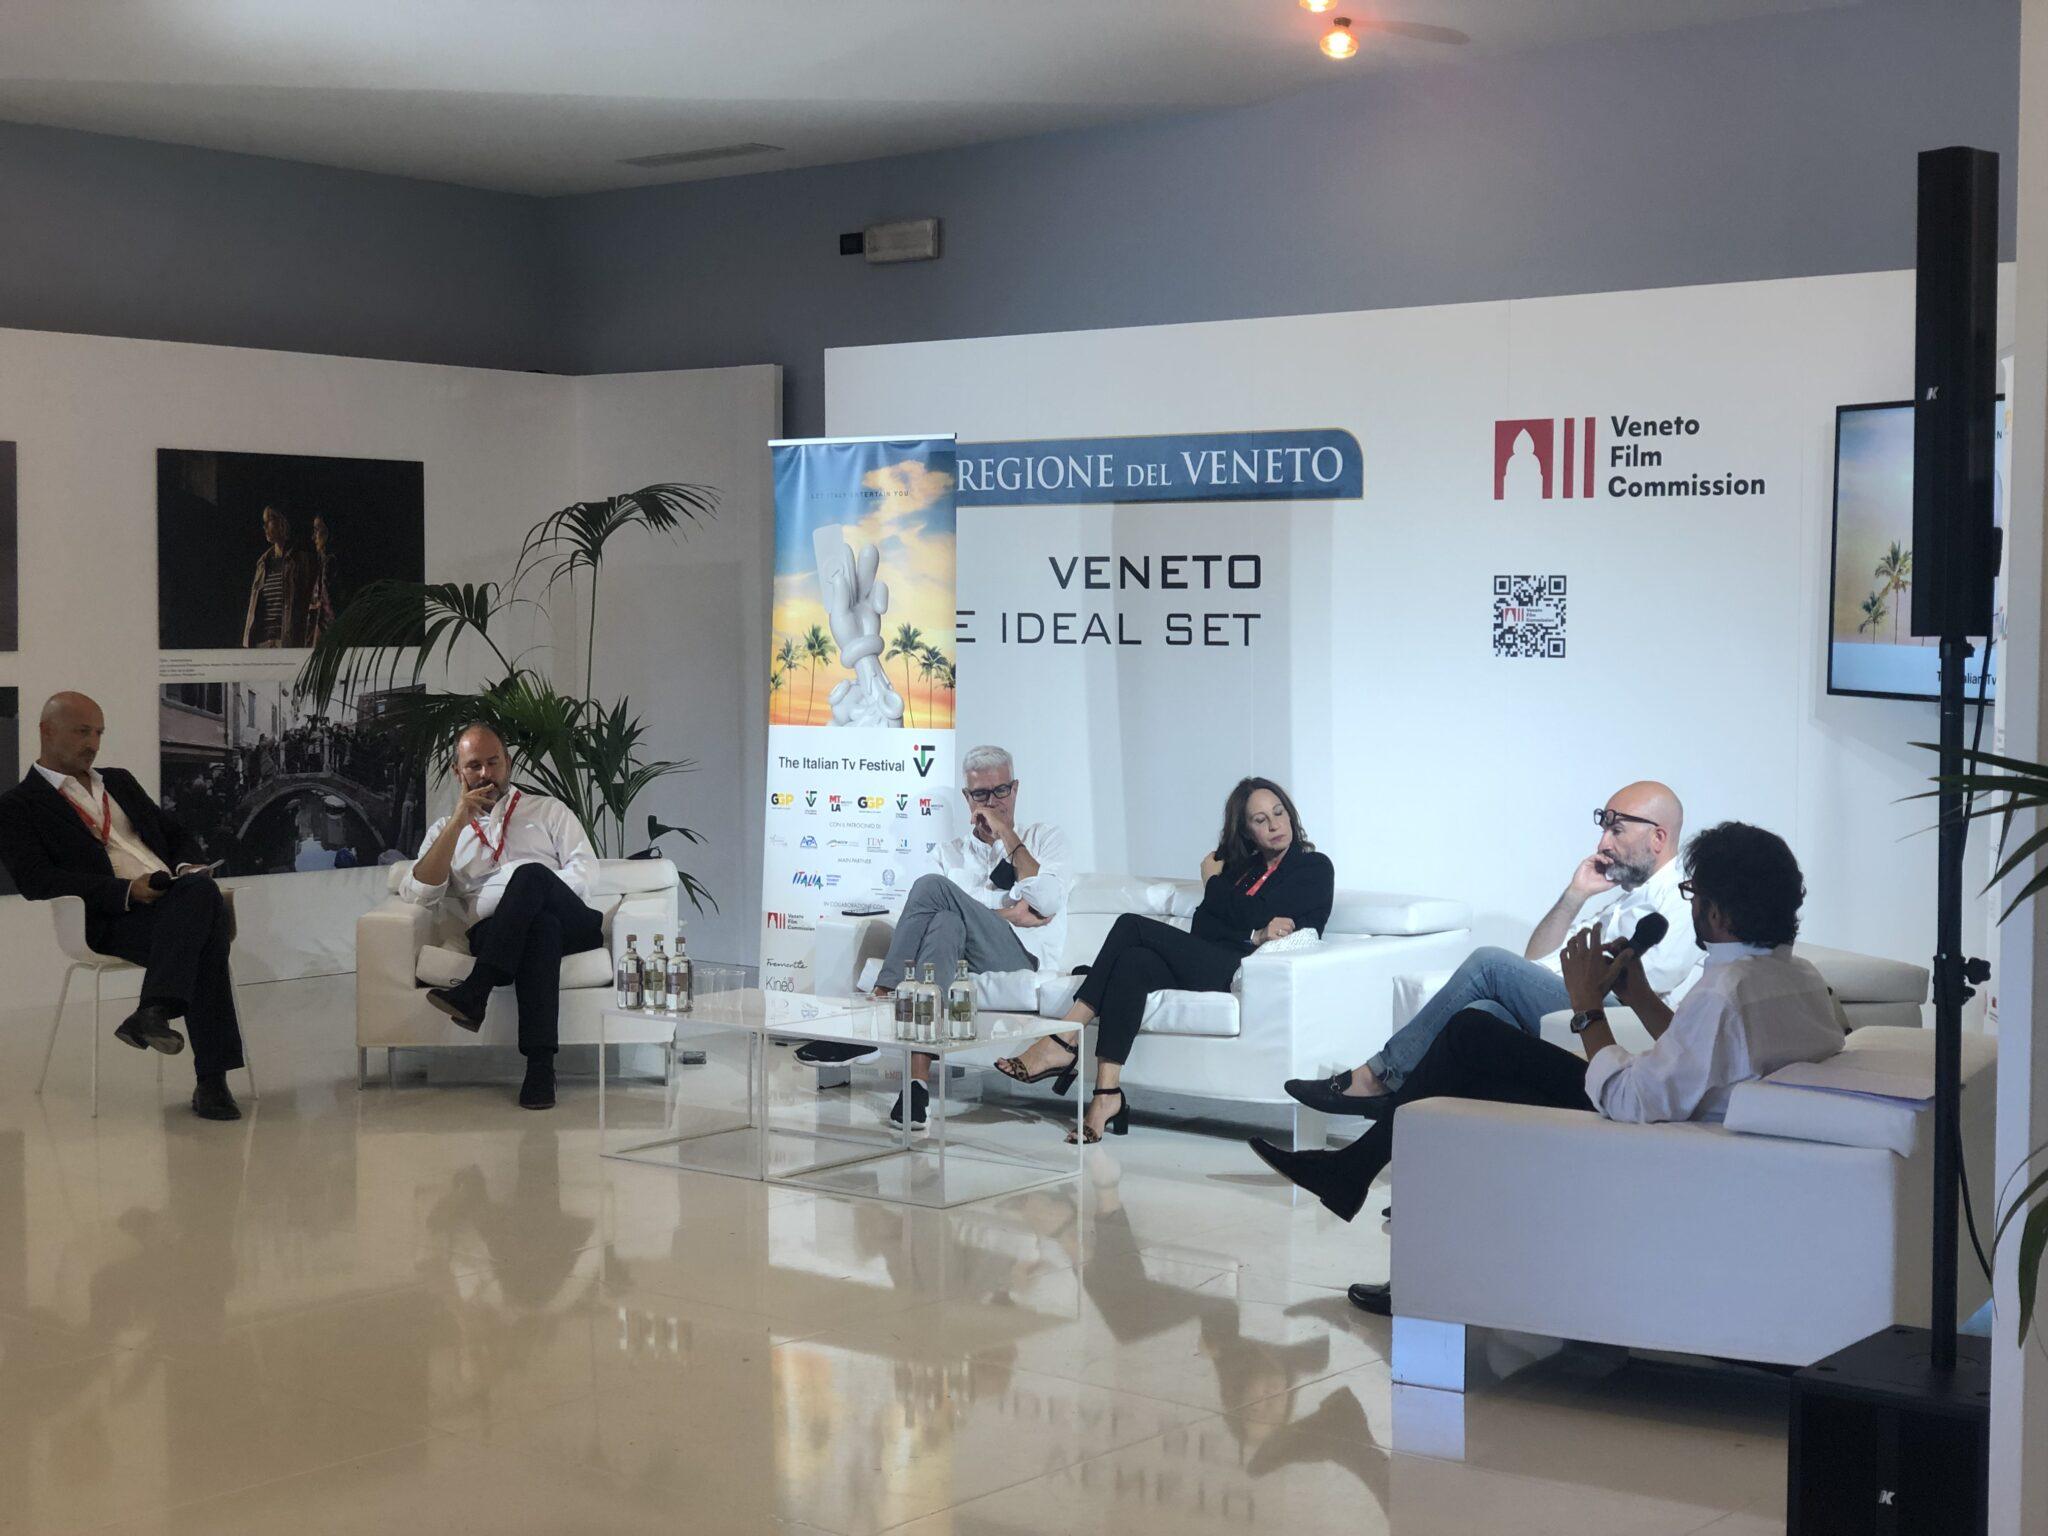 https://www.ittvfestival.com/blog/author/francesca/